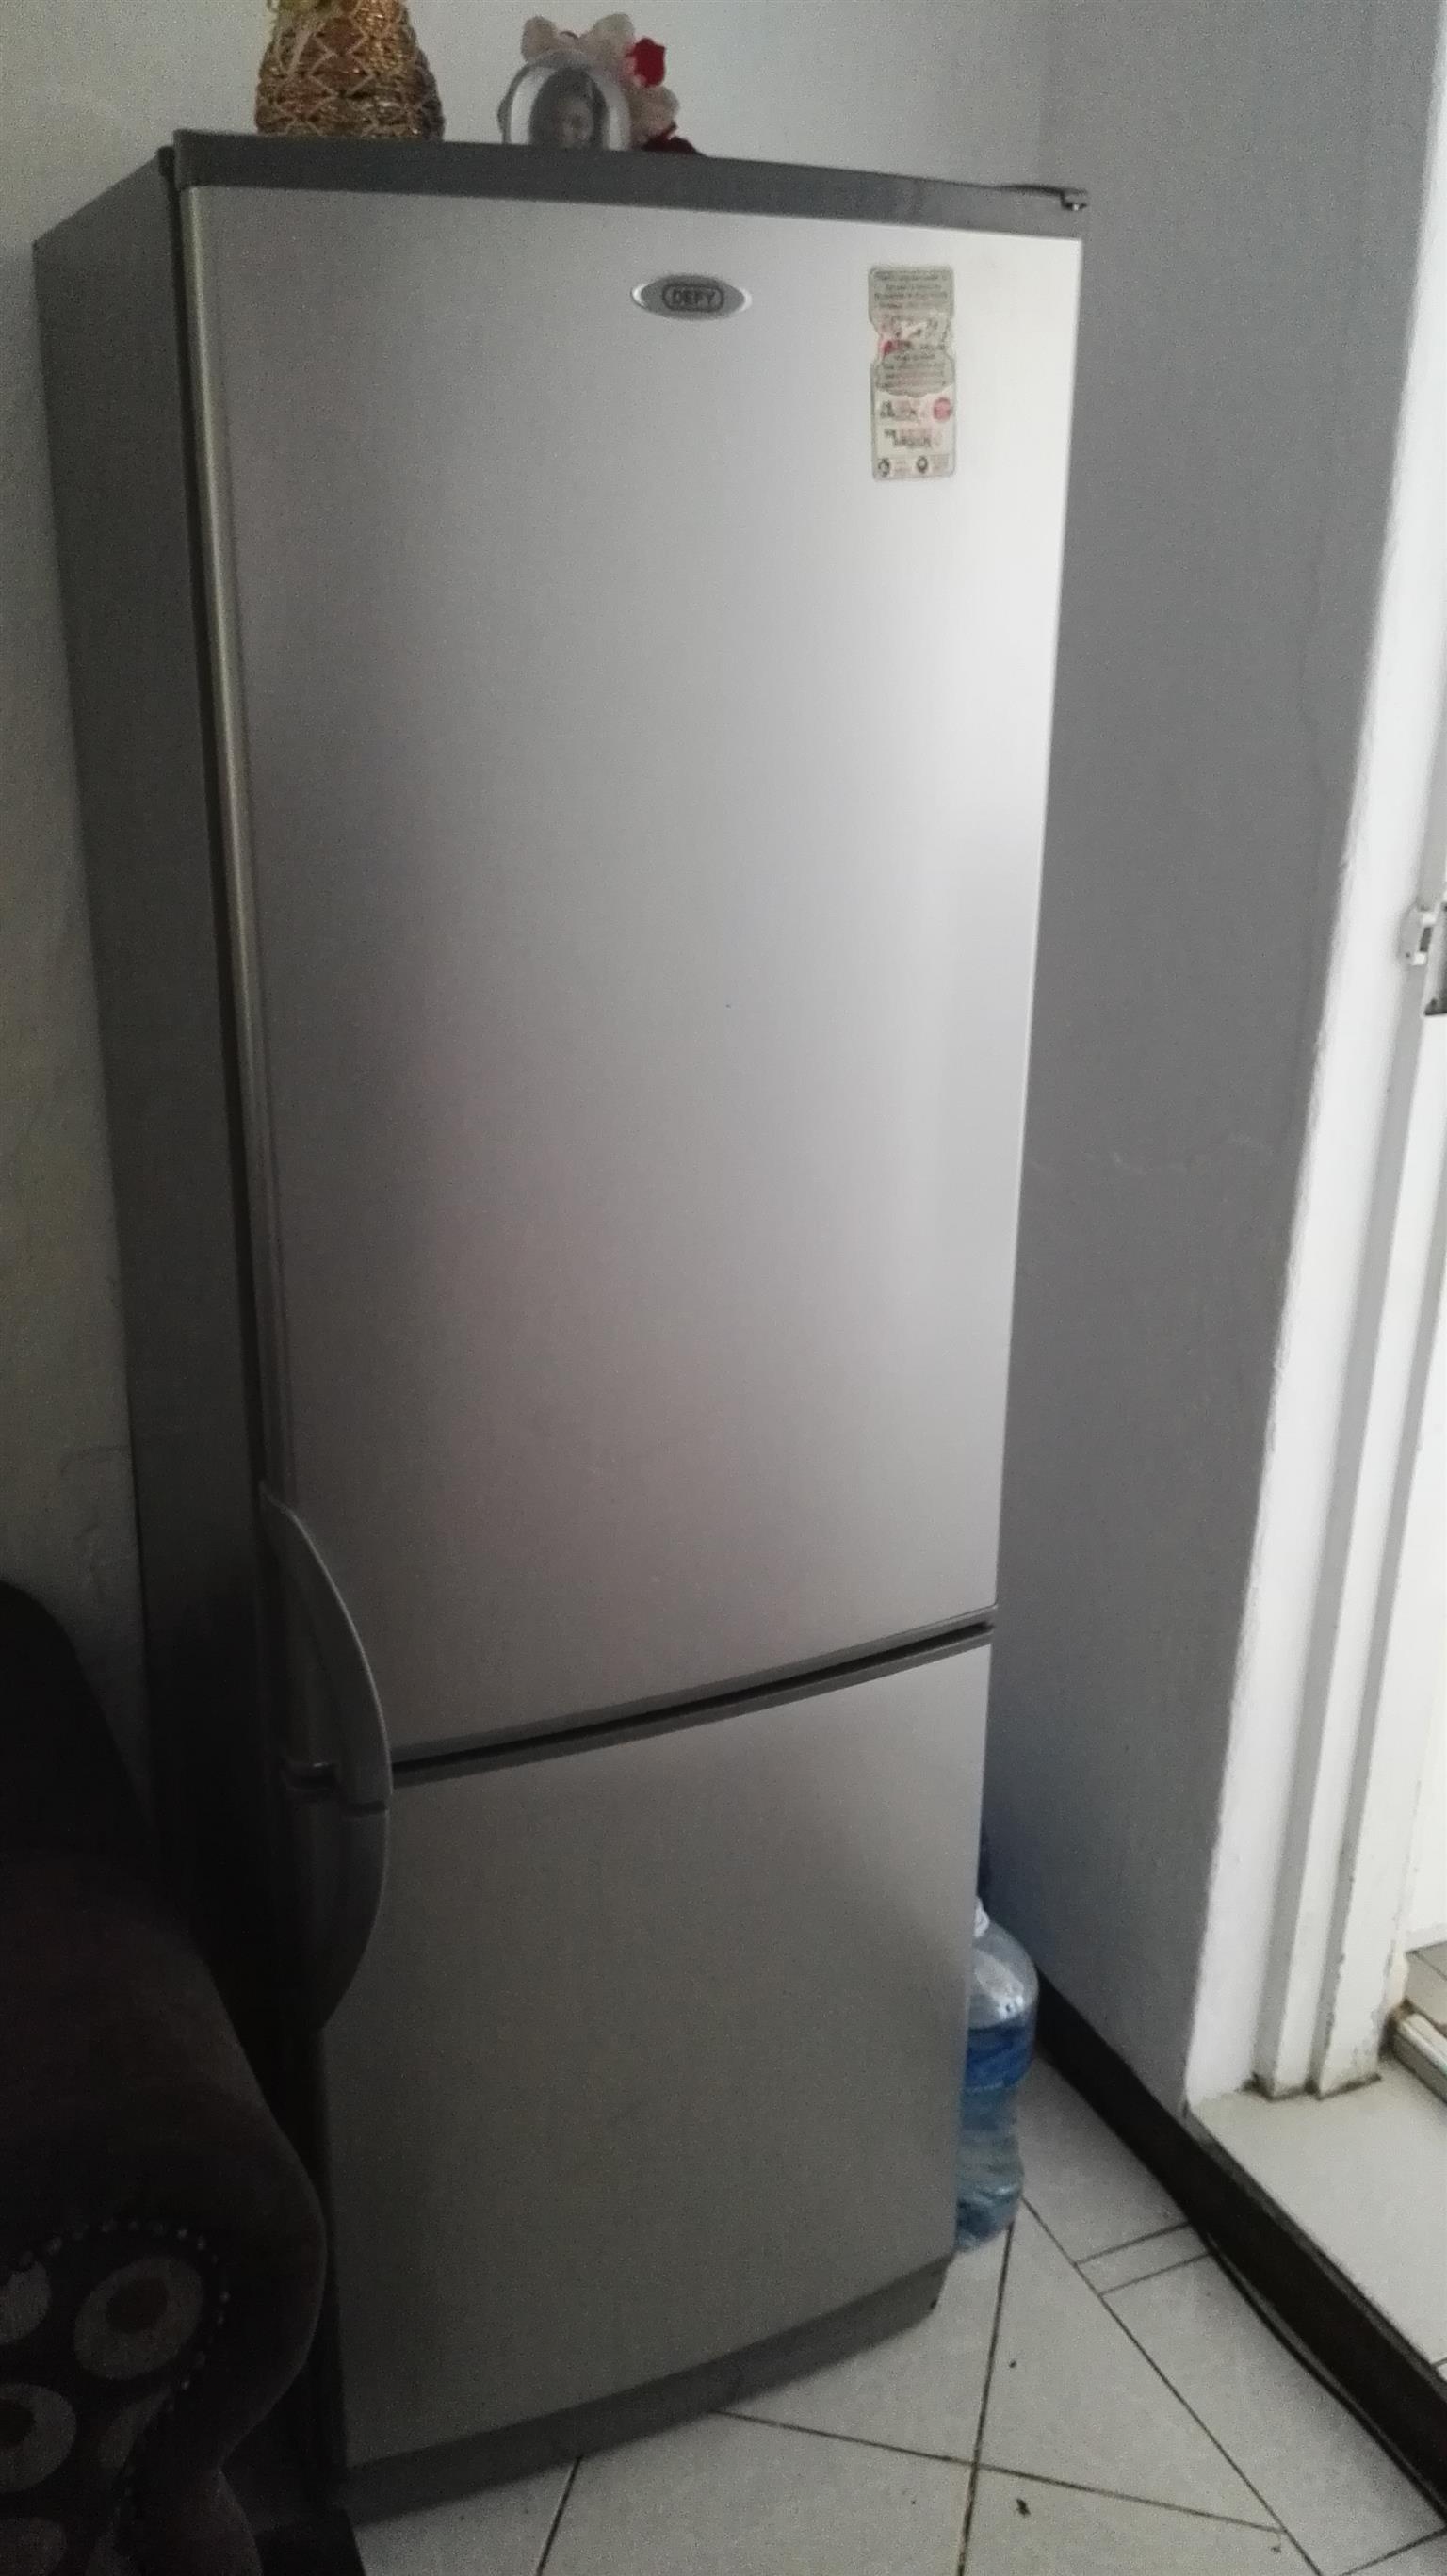 DEFY fridge and Freezer for sale